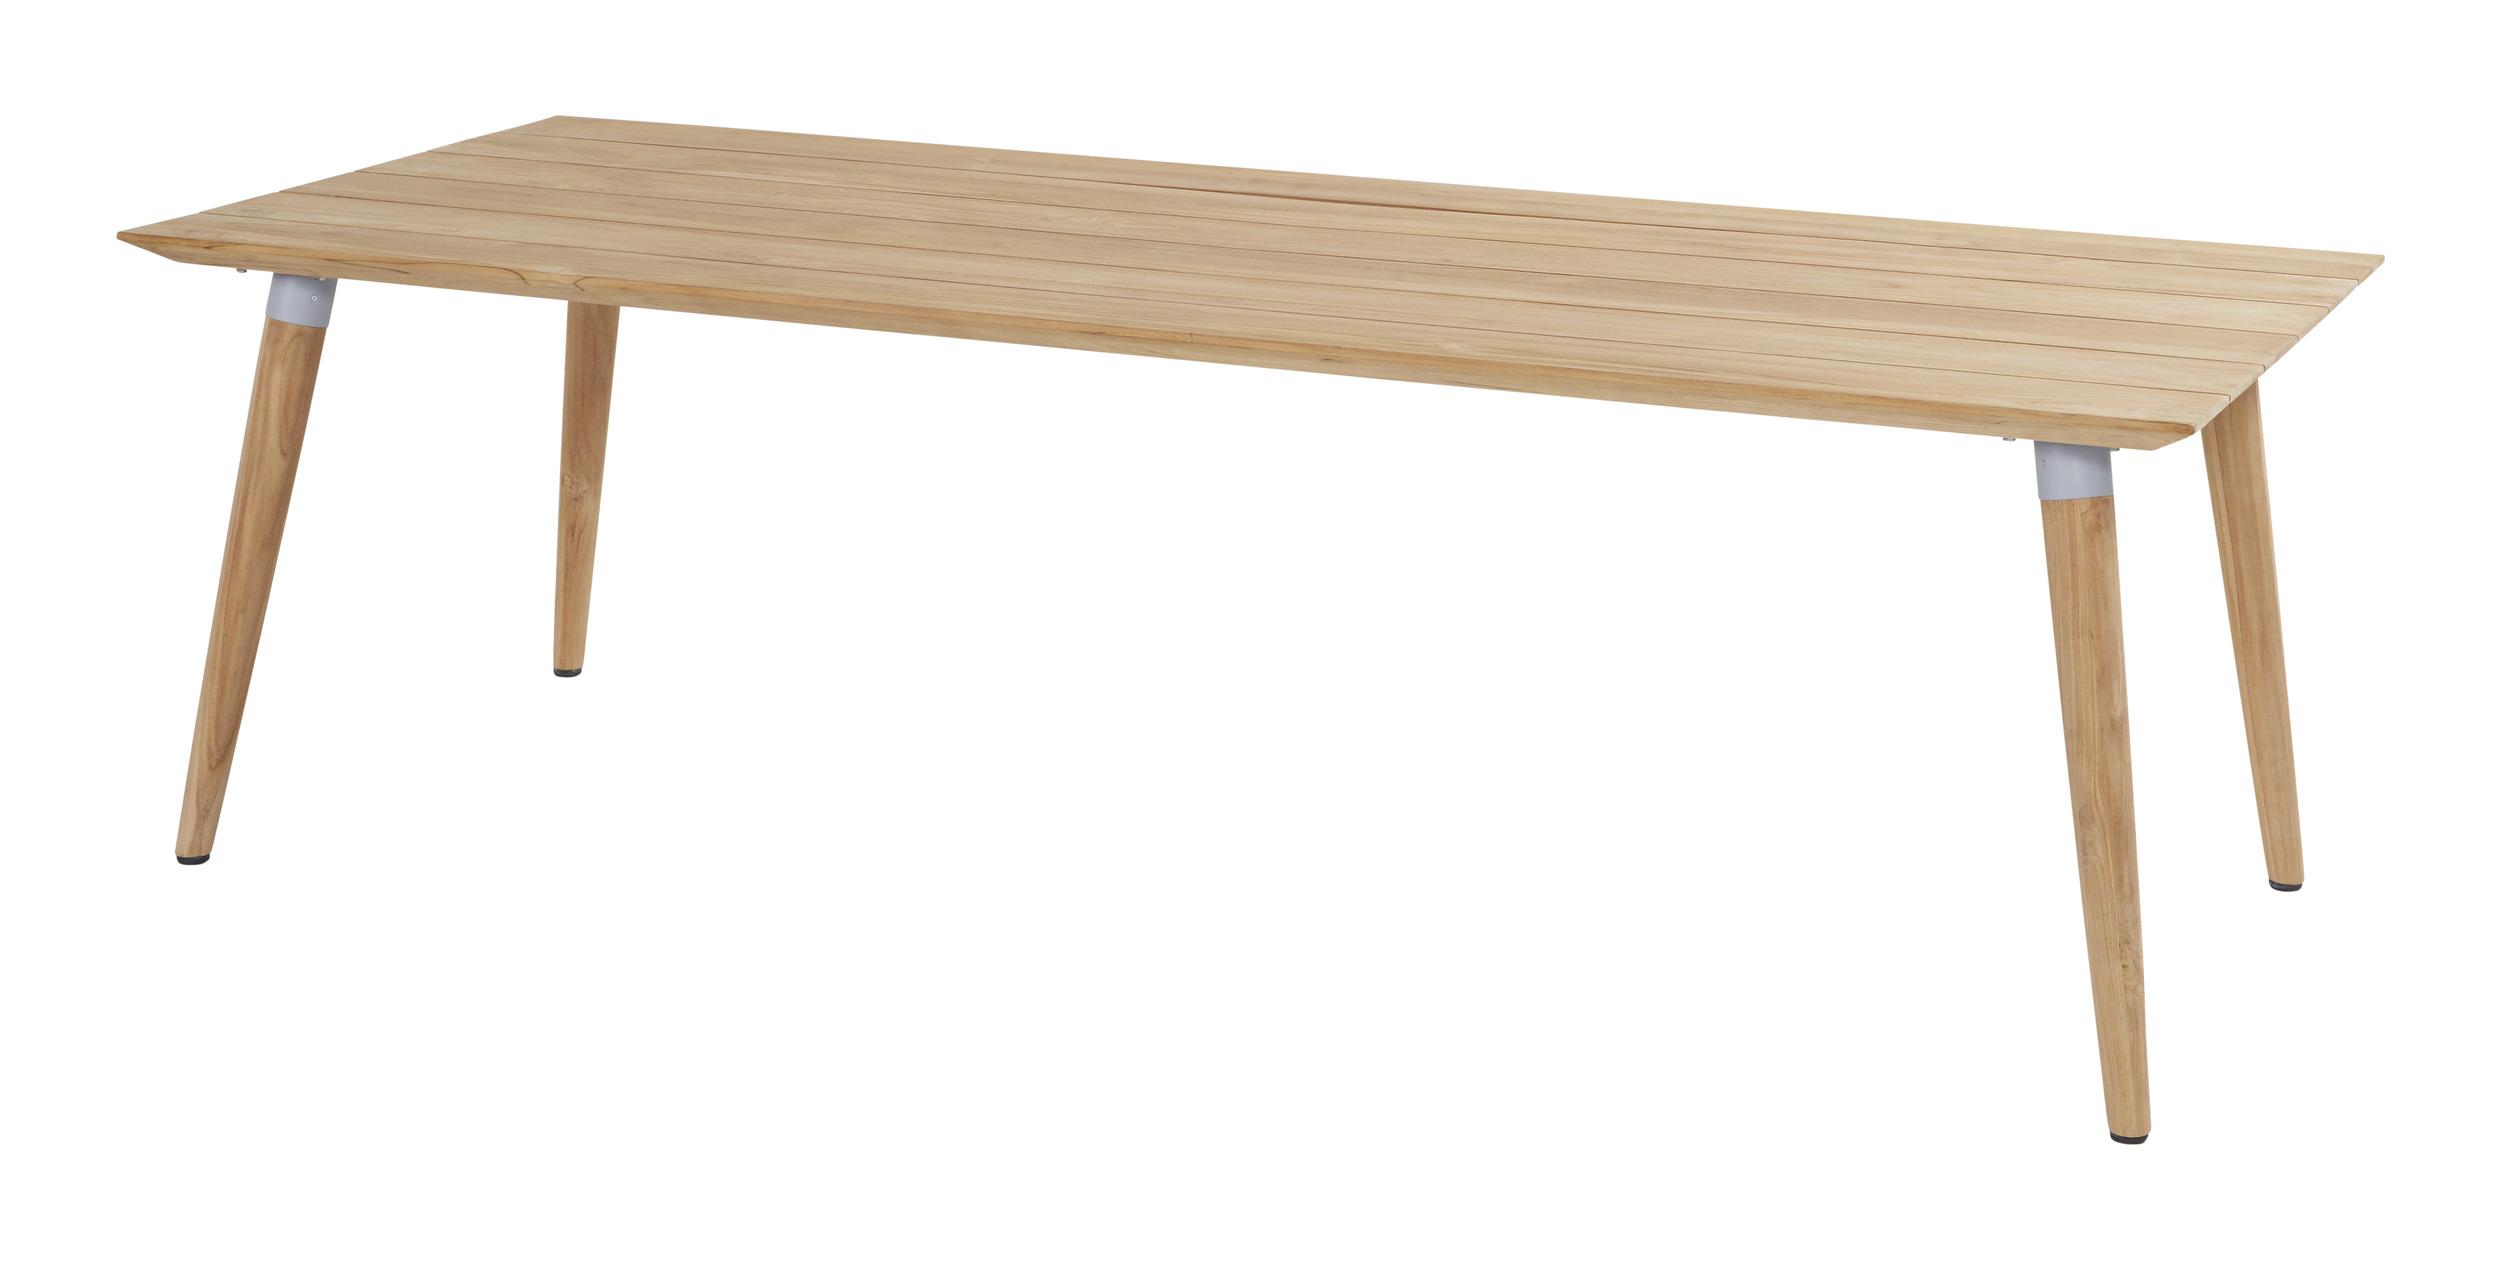 Hartman Tuintafel 'Sophie' Teak, 240 x 100cm, kleur Grijs